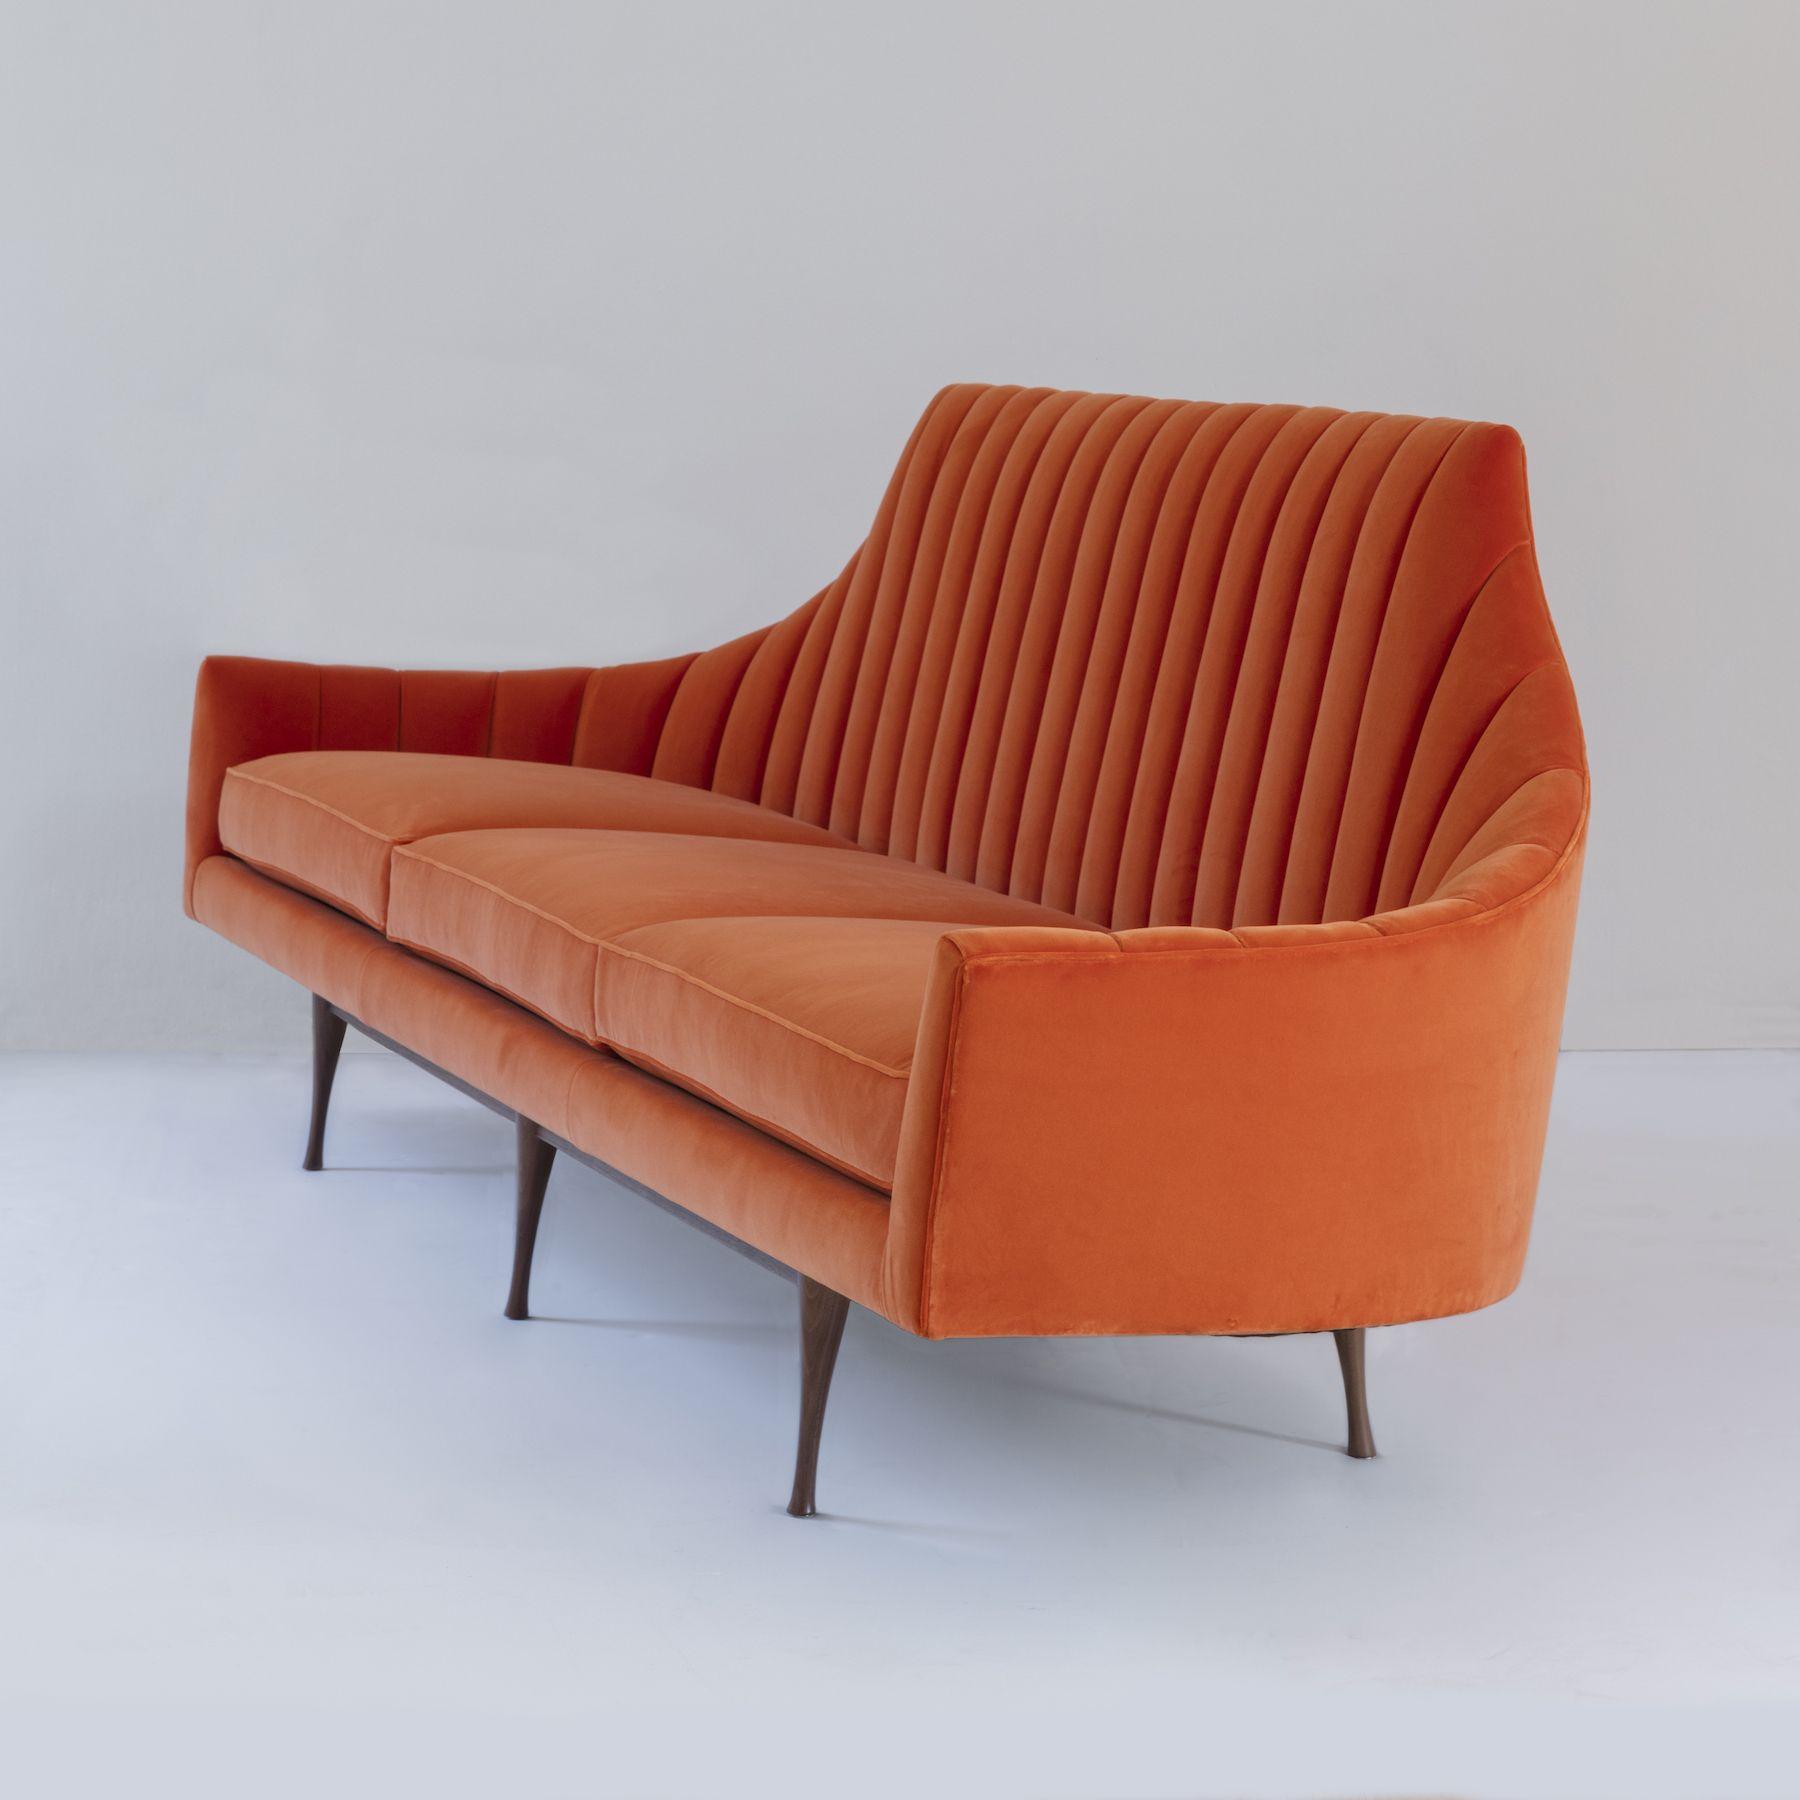 Paul Mccobb Through The Eyes Of Ralph Pucci Paul Mccobb Love Seat Scandinavian Furniture